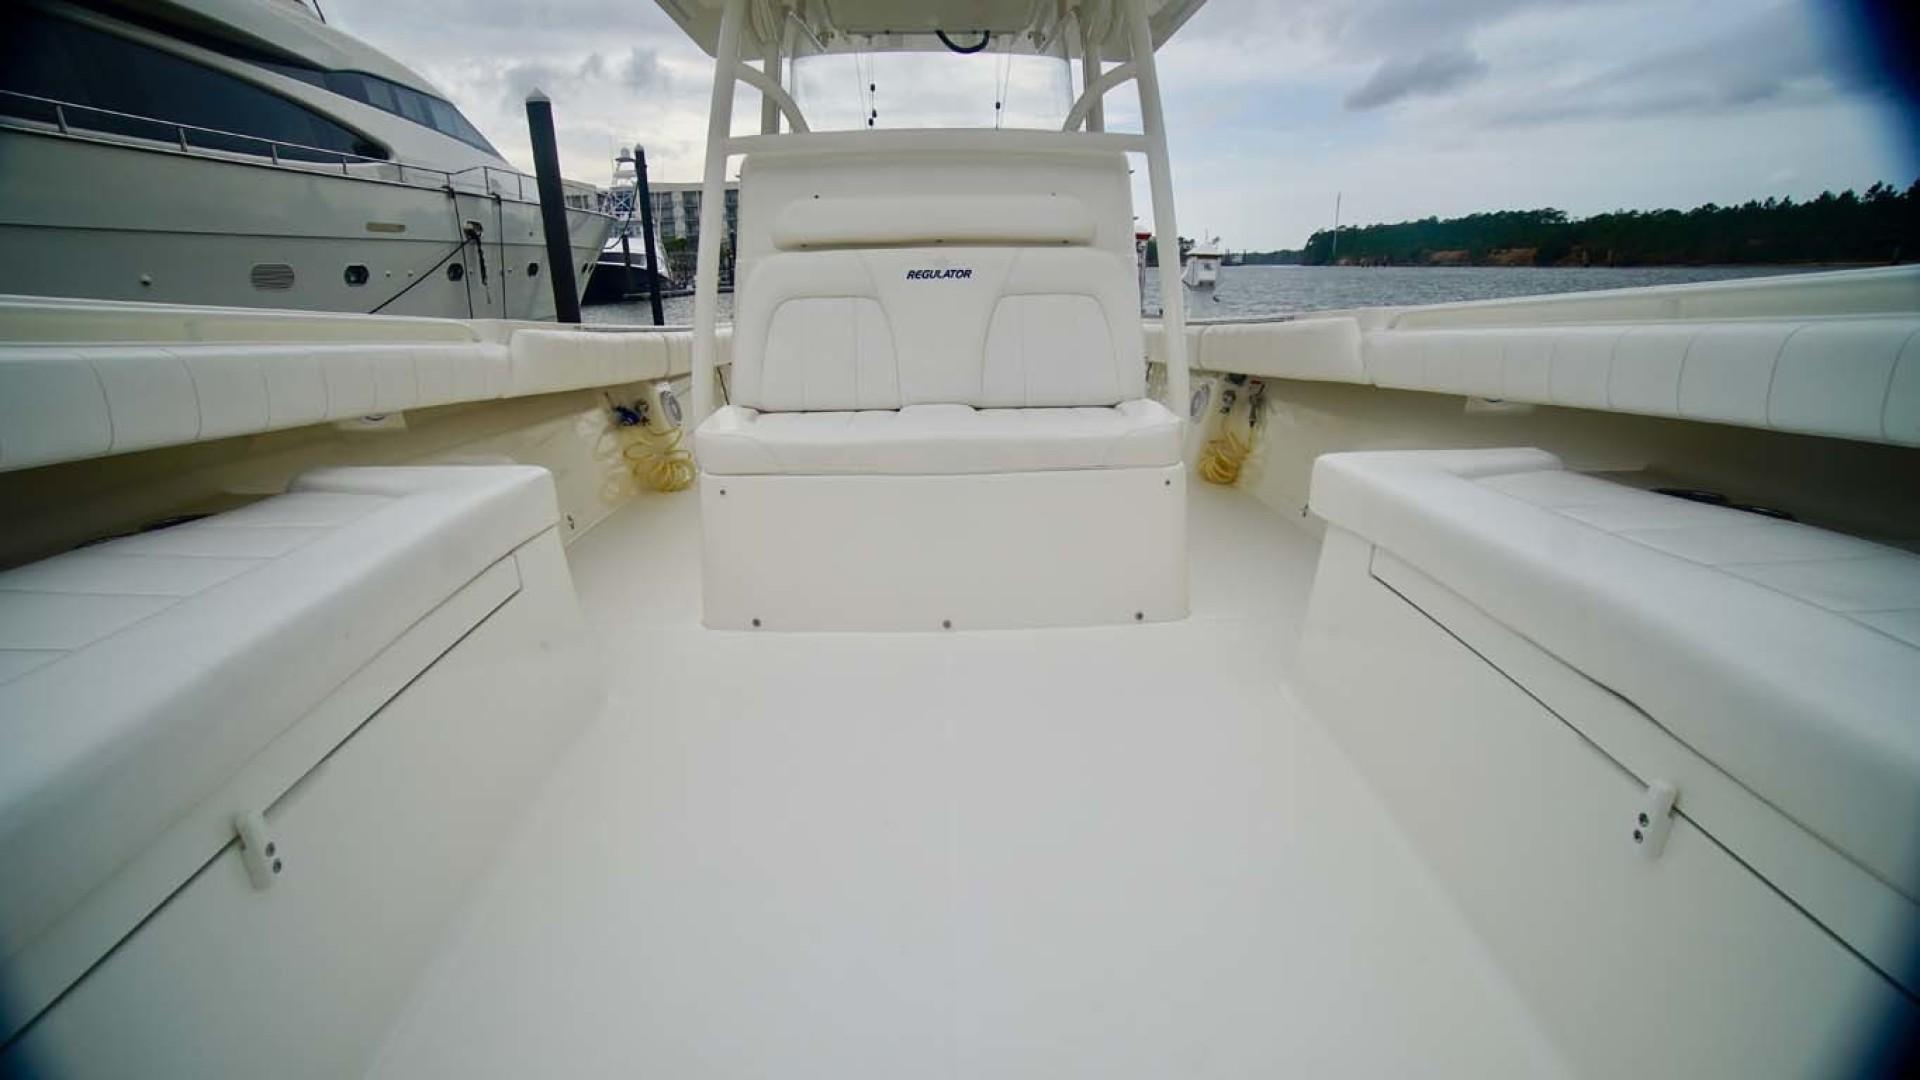 Regulator-34 2015 -Orange Beach-Alabama-United States-Looking Aft From Bow-1301939 | Thumbnail